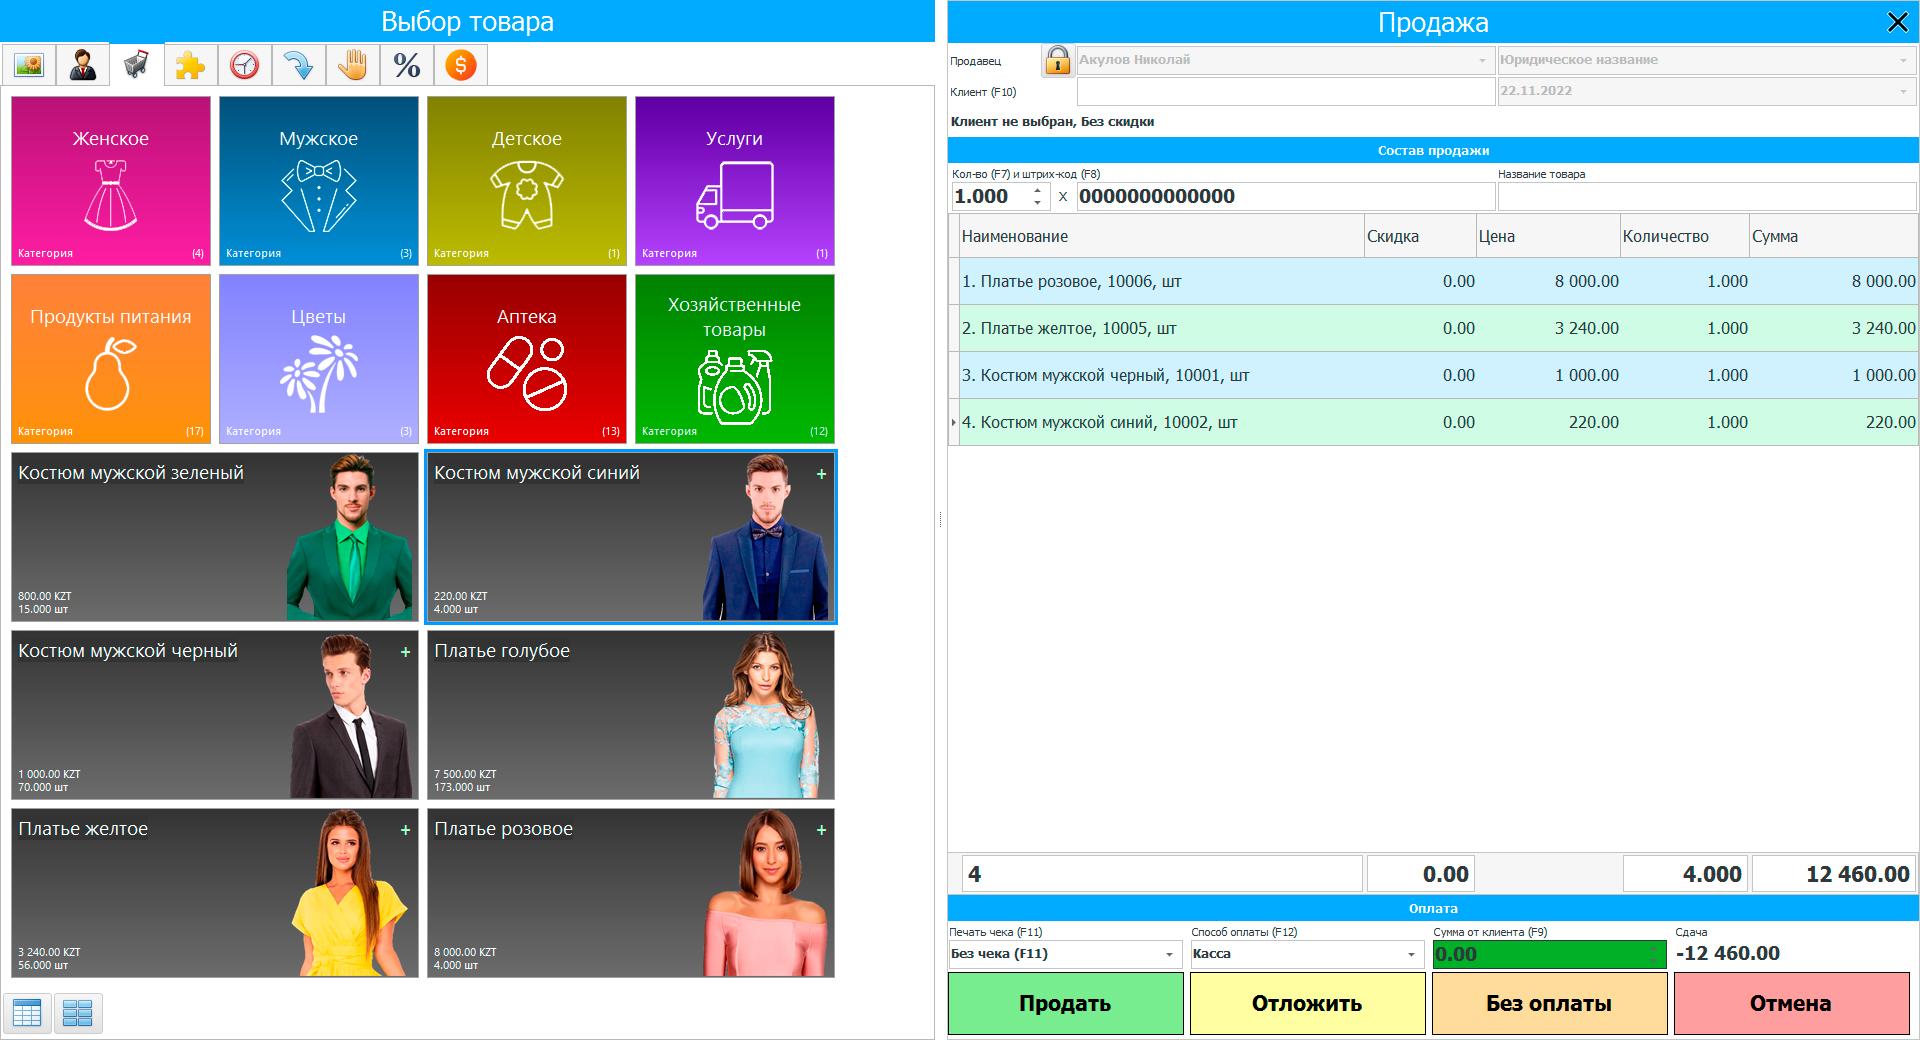 Adobe reader 10 rus для windows xp